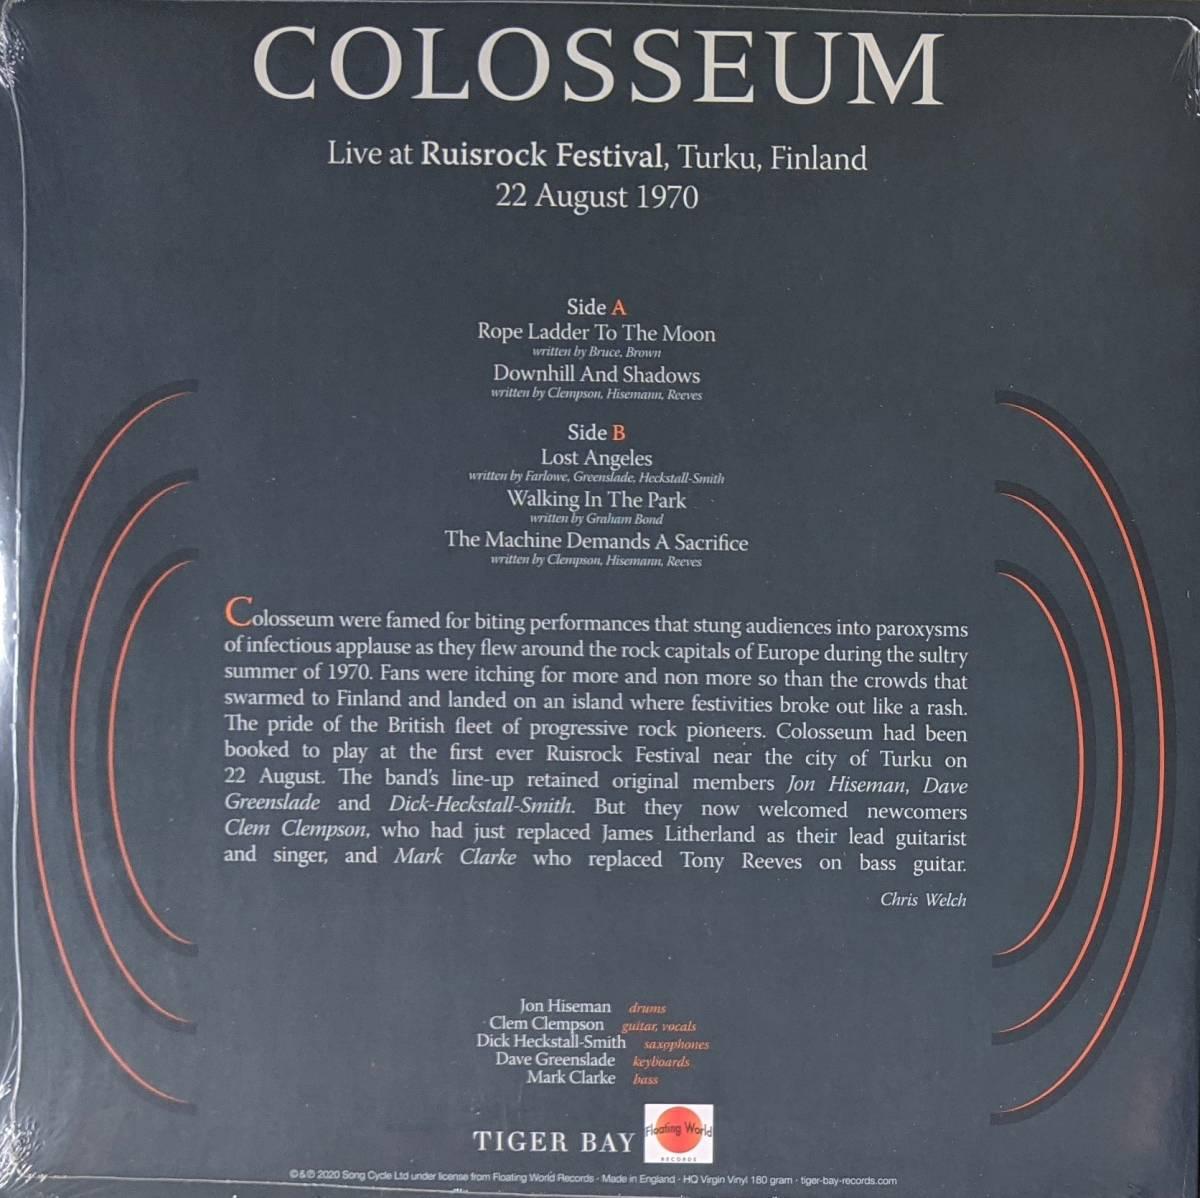 Colosseum コロシアム - Live At Ruisrock Festival, Turku, Finland 22 August 1970 限定リマスター再発アナログ・レコード